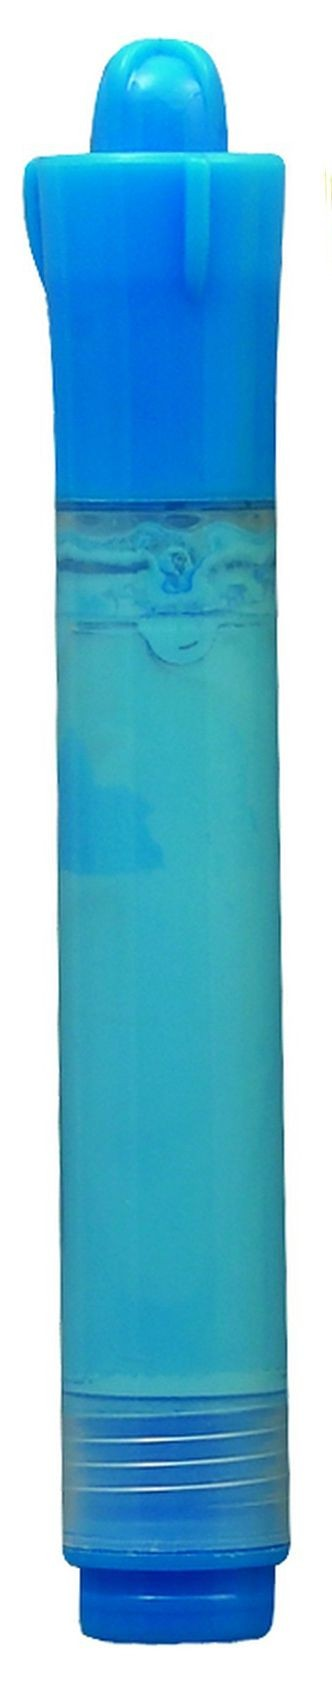 Deluxe Neon Marker, Blue